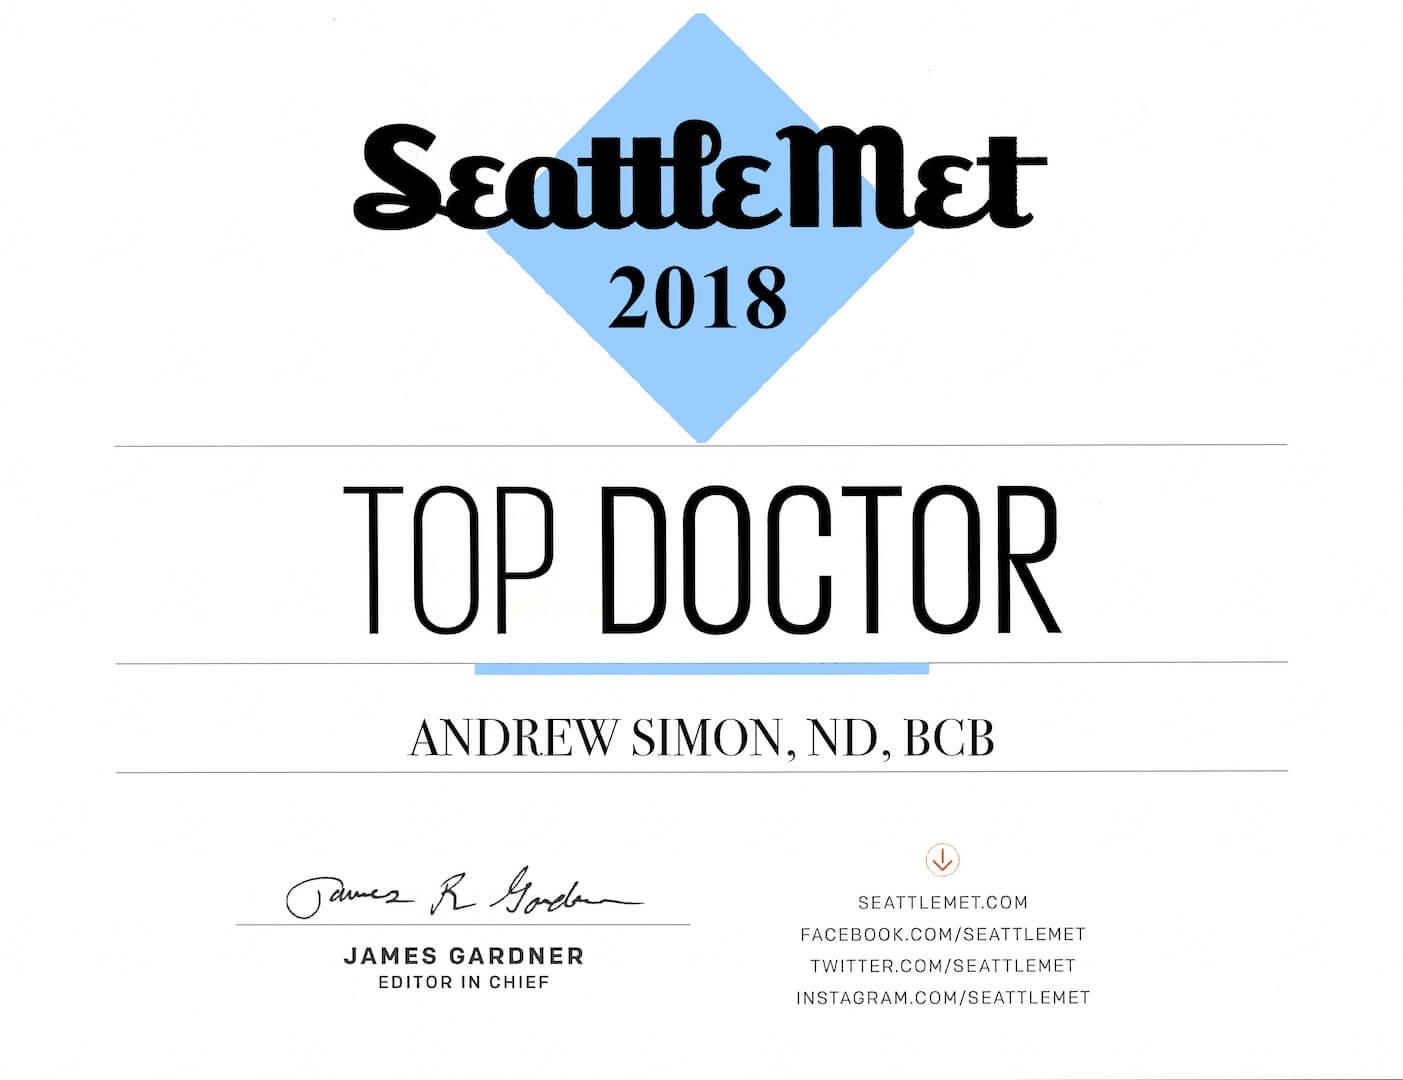 Seattle Met Top Doctor 2018